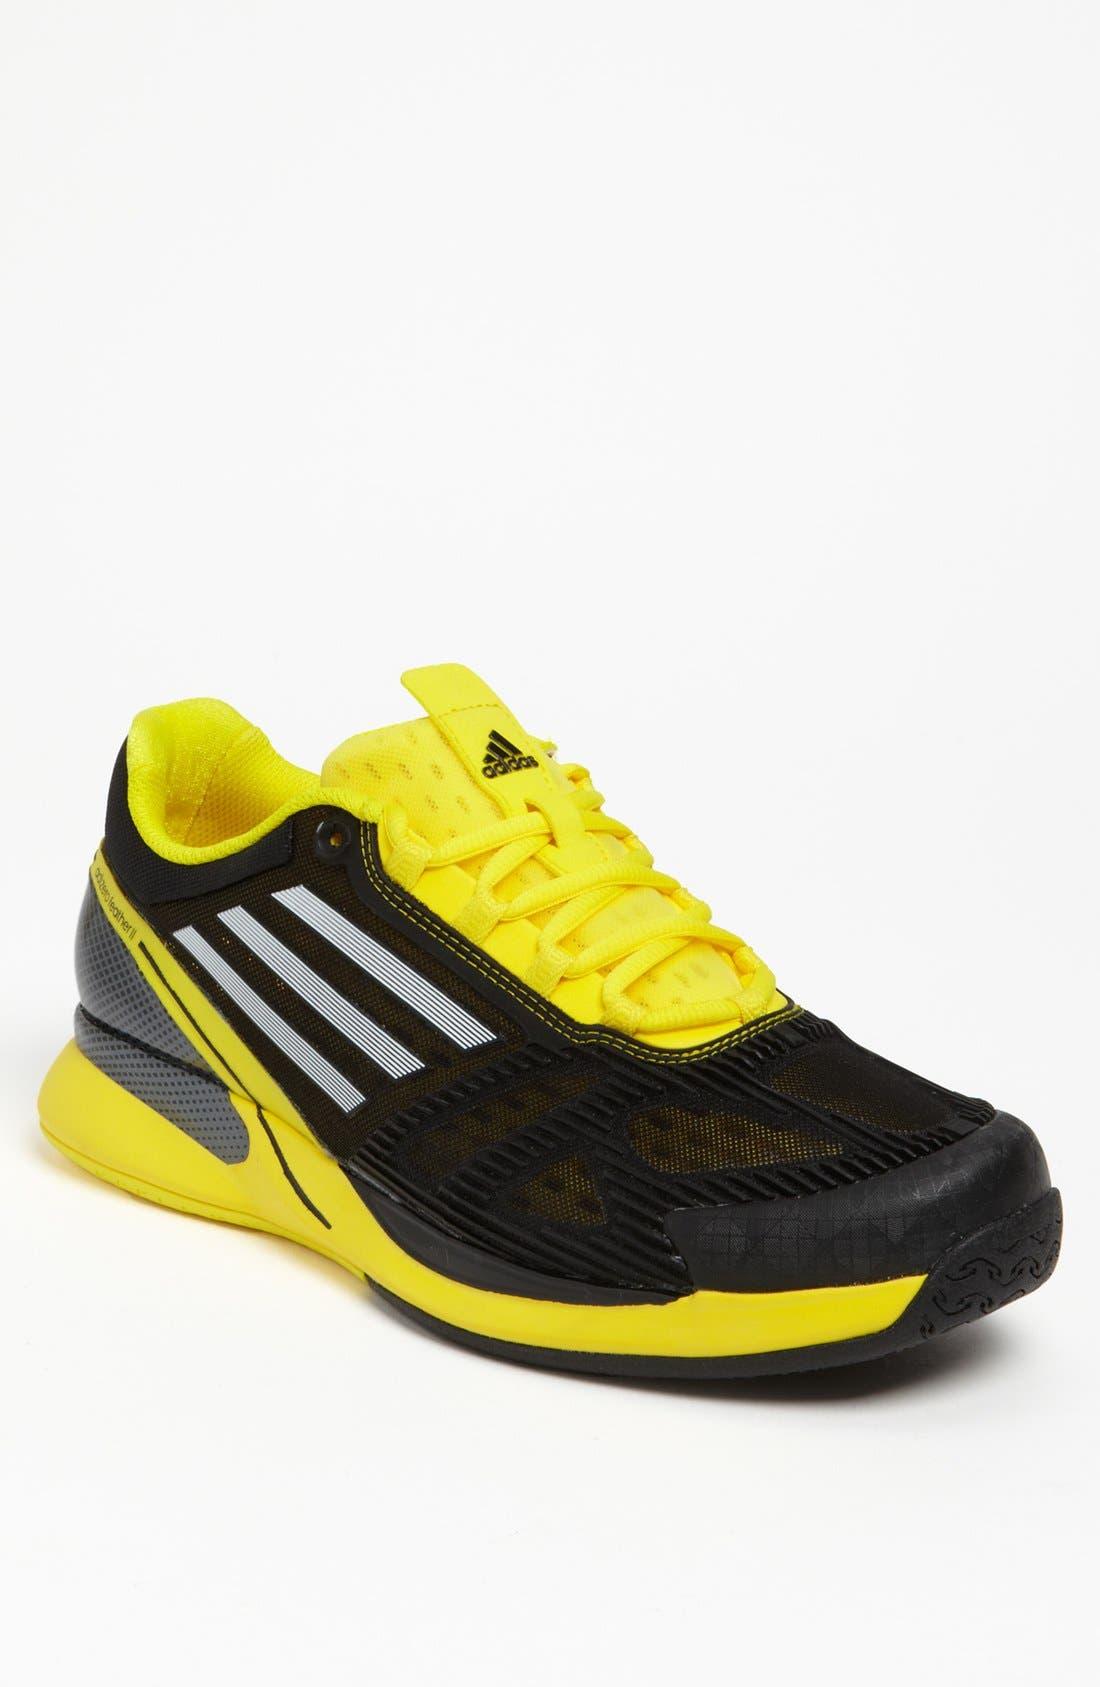 Main Image - adidas 'CLIMACOOL® adizero Feather II' Tennis Shoe (Men)